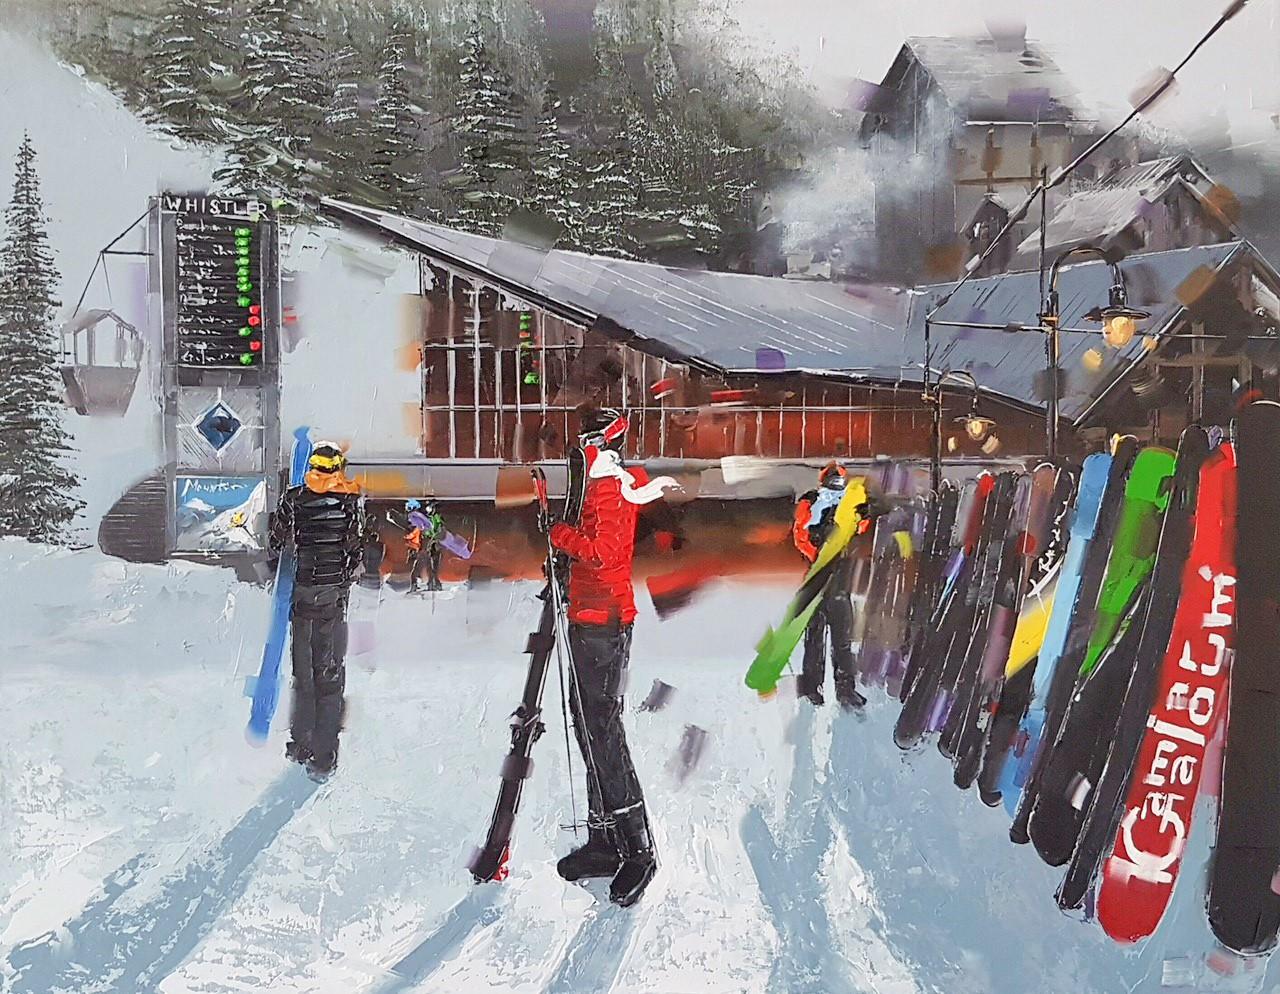 Kamiar Gajoum Apres Ski Whistler Blackcomb Original Oil Painting 14x18